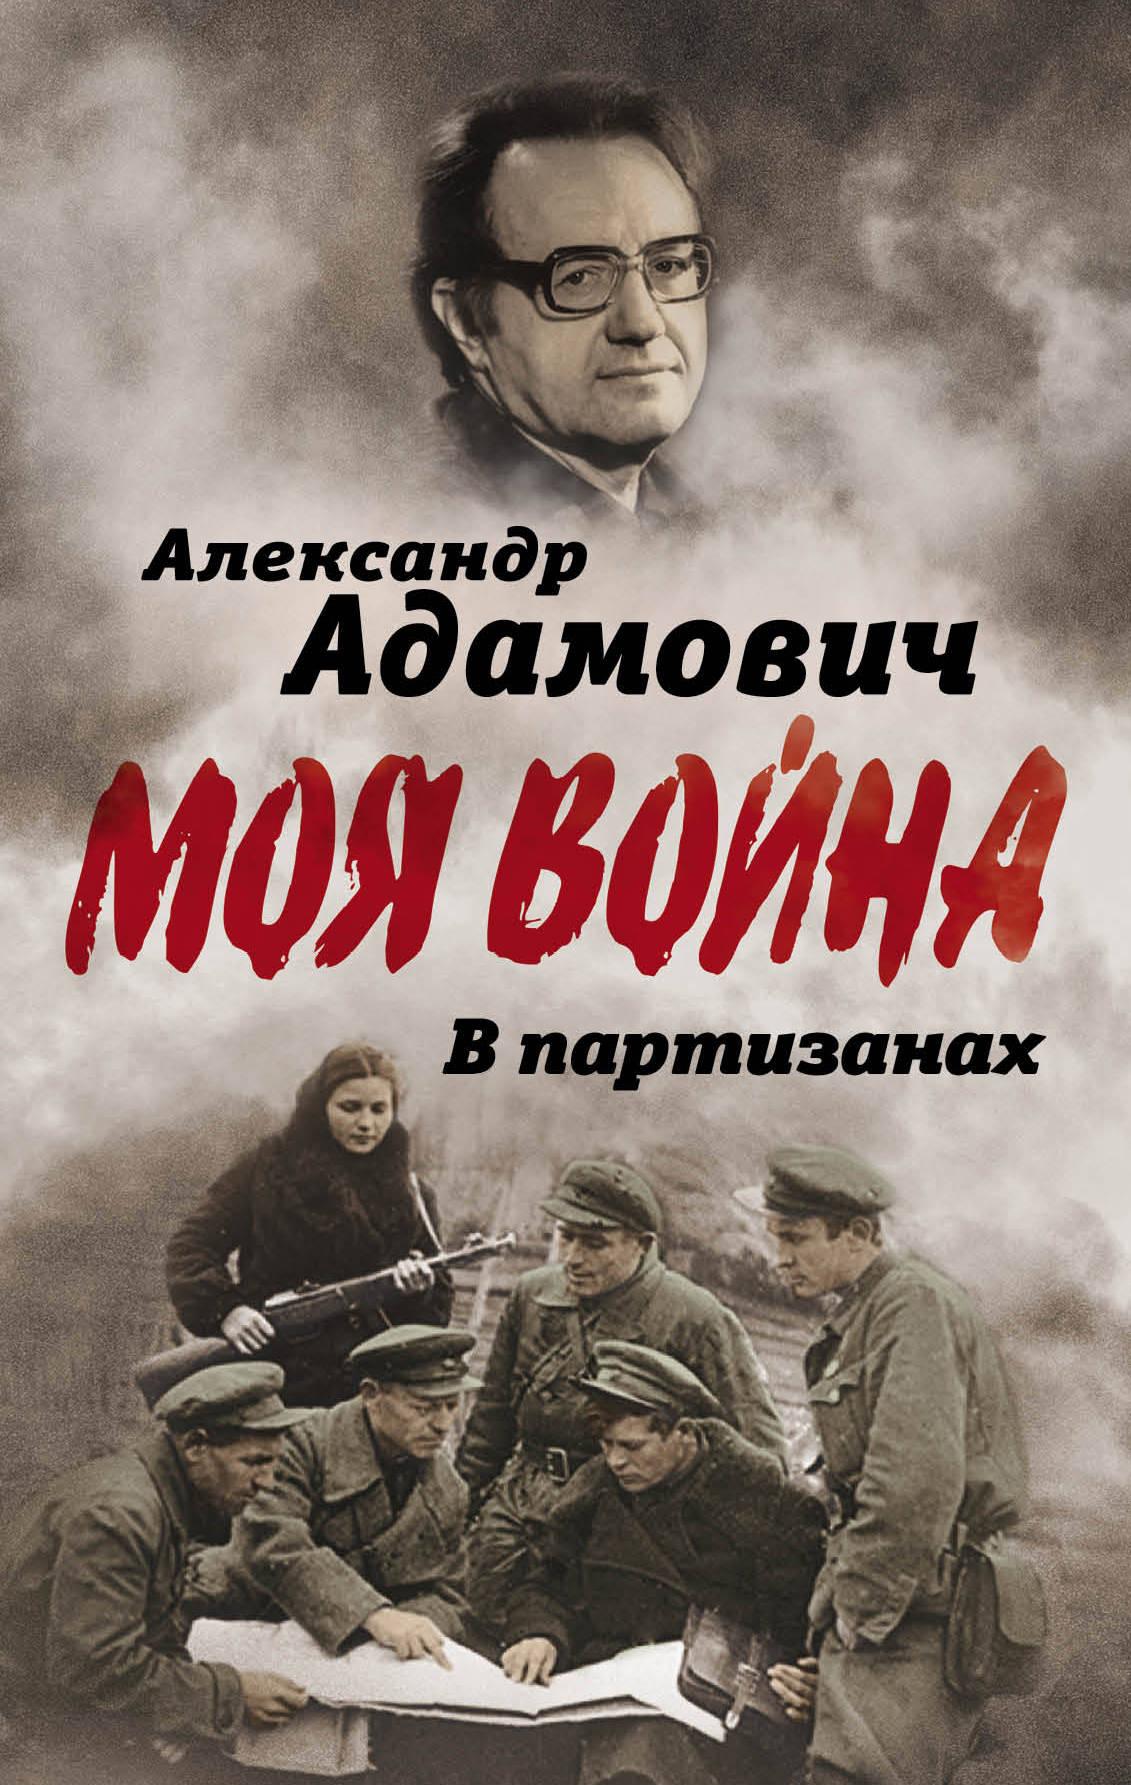 Адамович Алесь В партизанах адамович а каратели